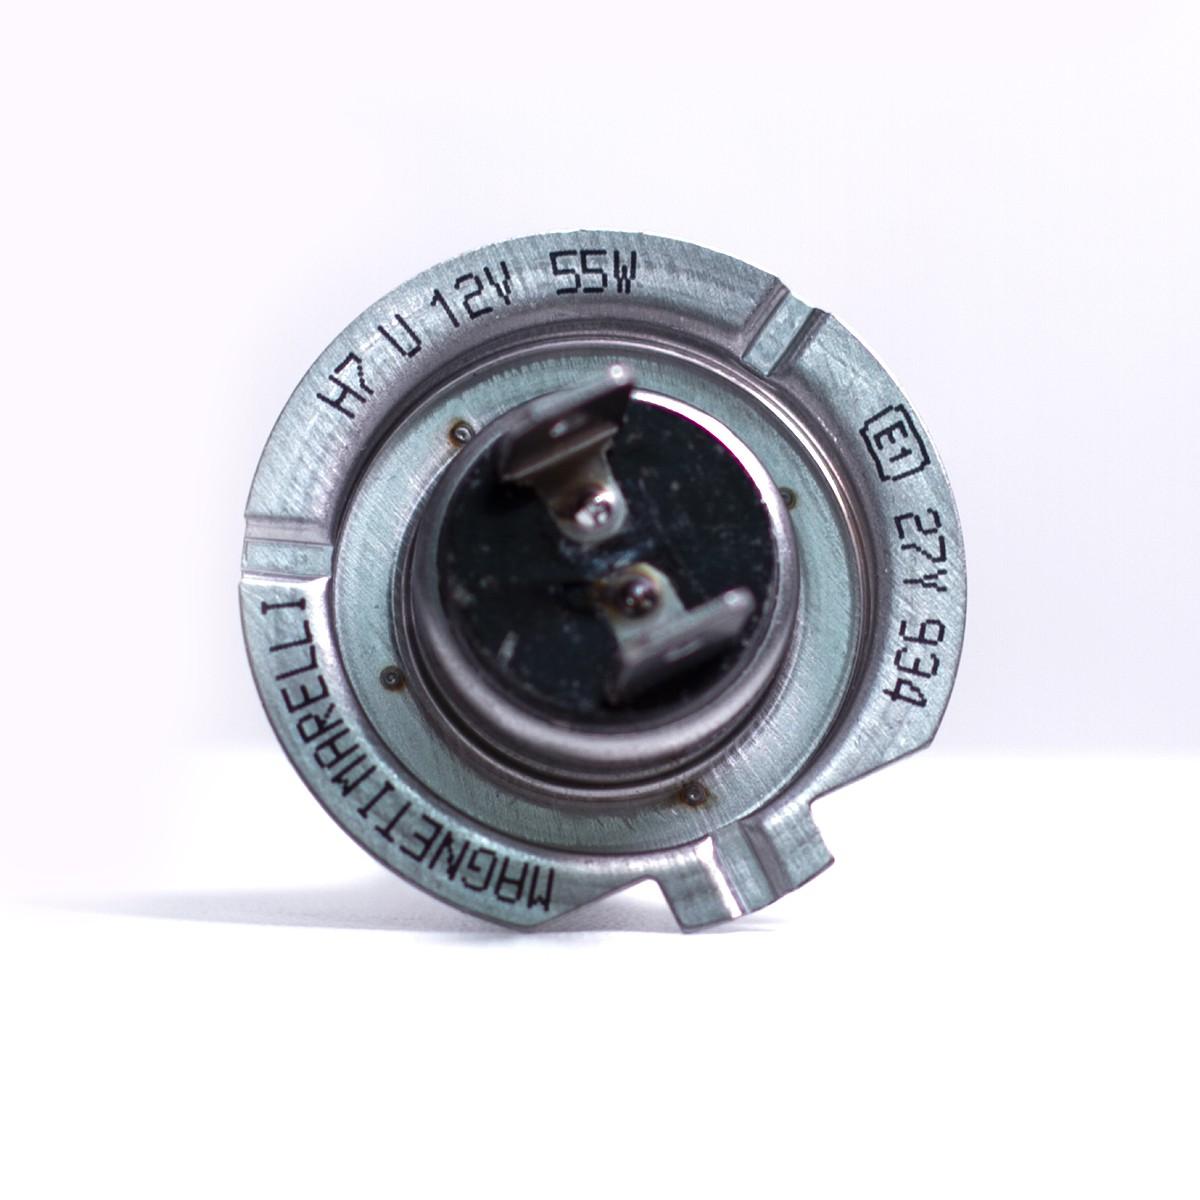 Lâmpada H7 Standart Farol Magneti Marelli 12v 55w Comum